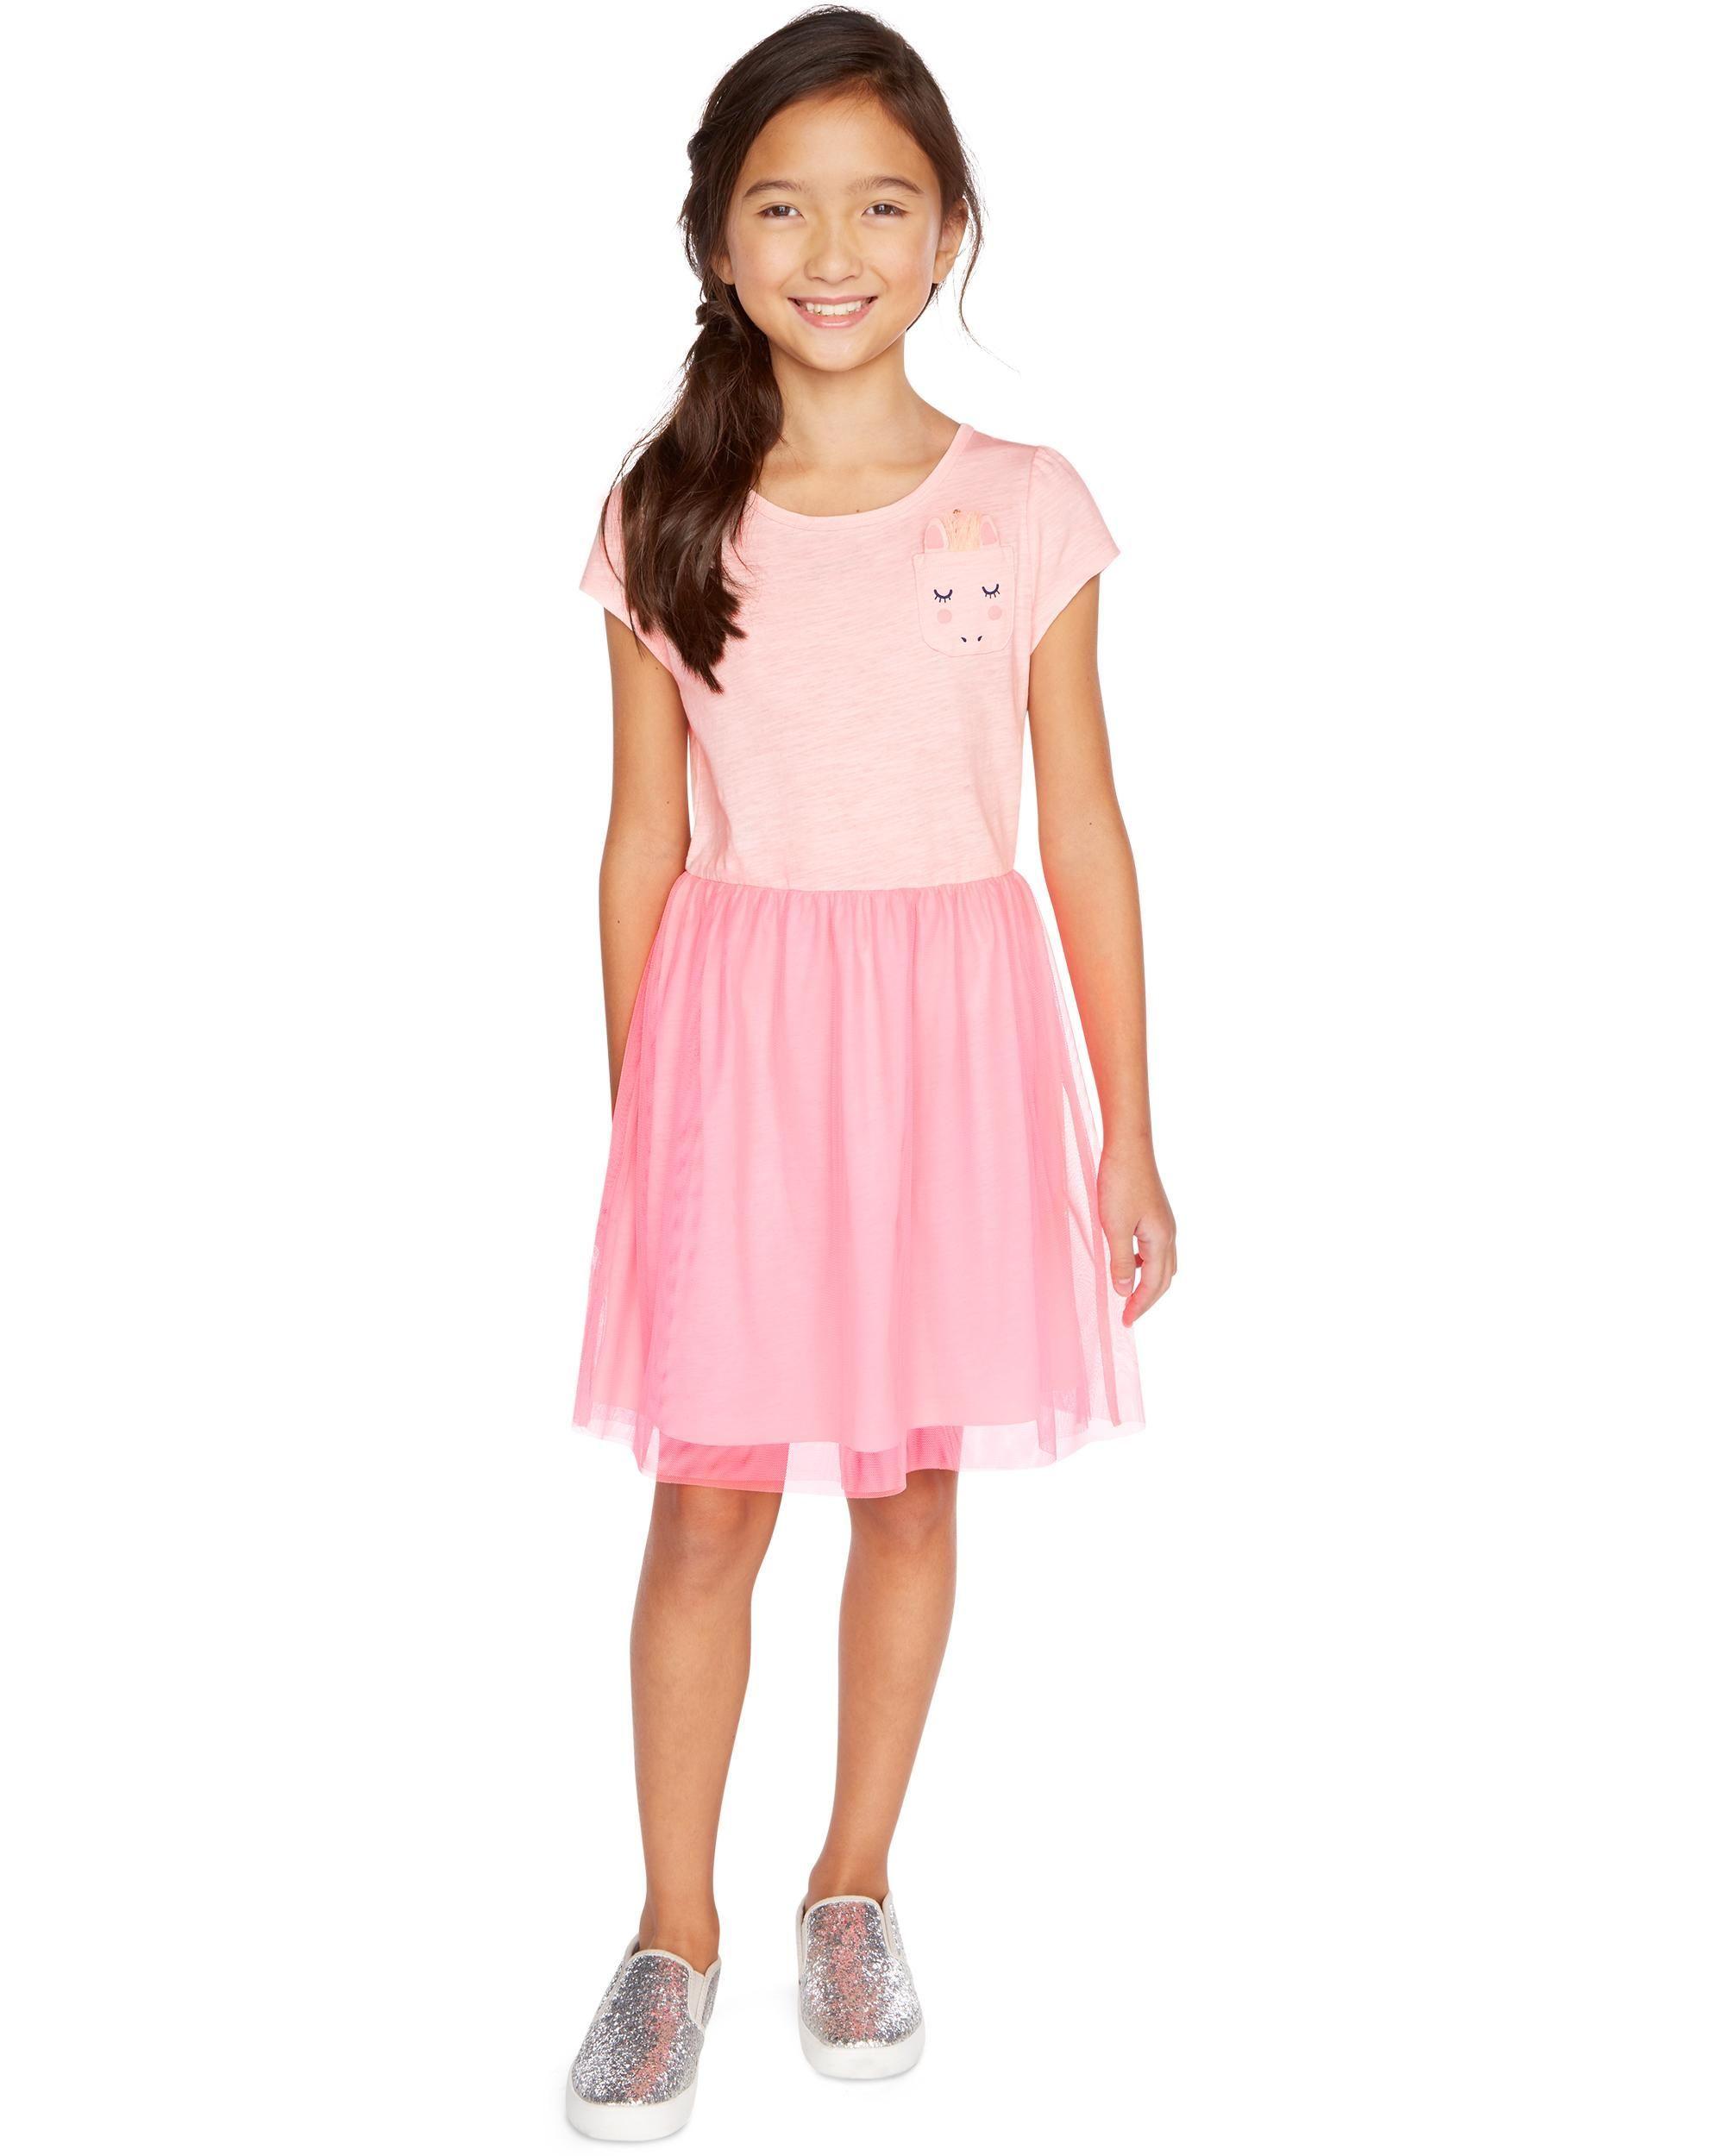 c708d1b4c9ad4 Unicorn Tulle Dress | Mackenzie's Style | Dresses kids girl, Dresses ...